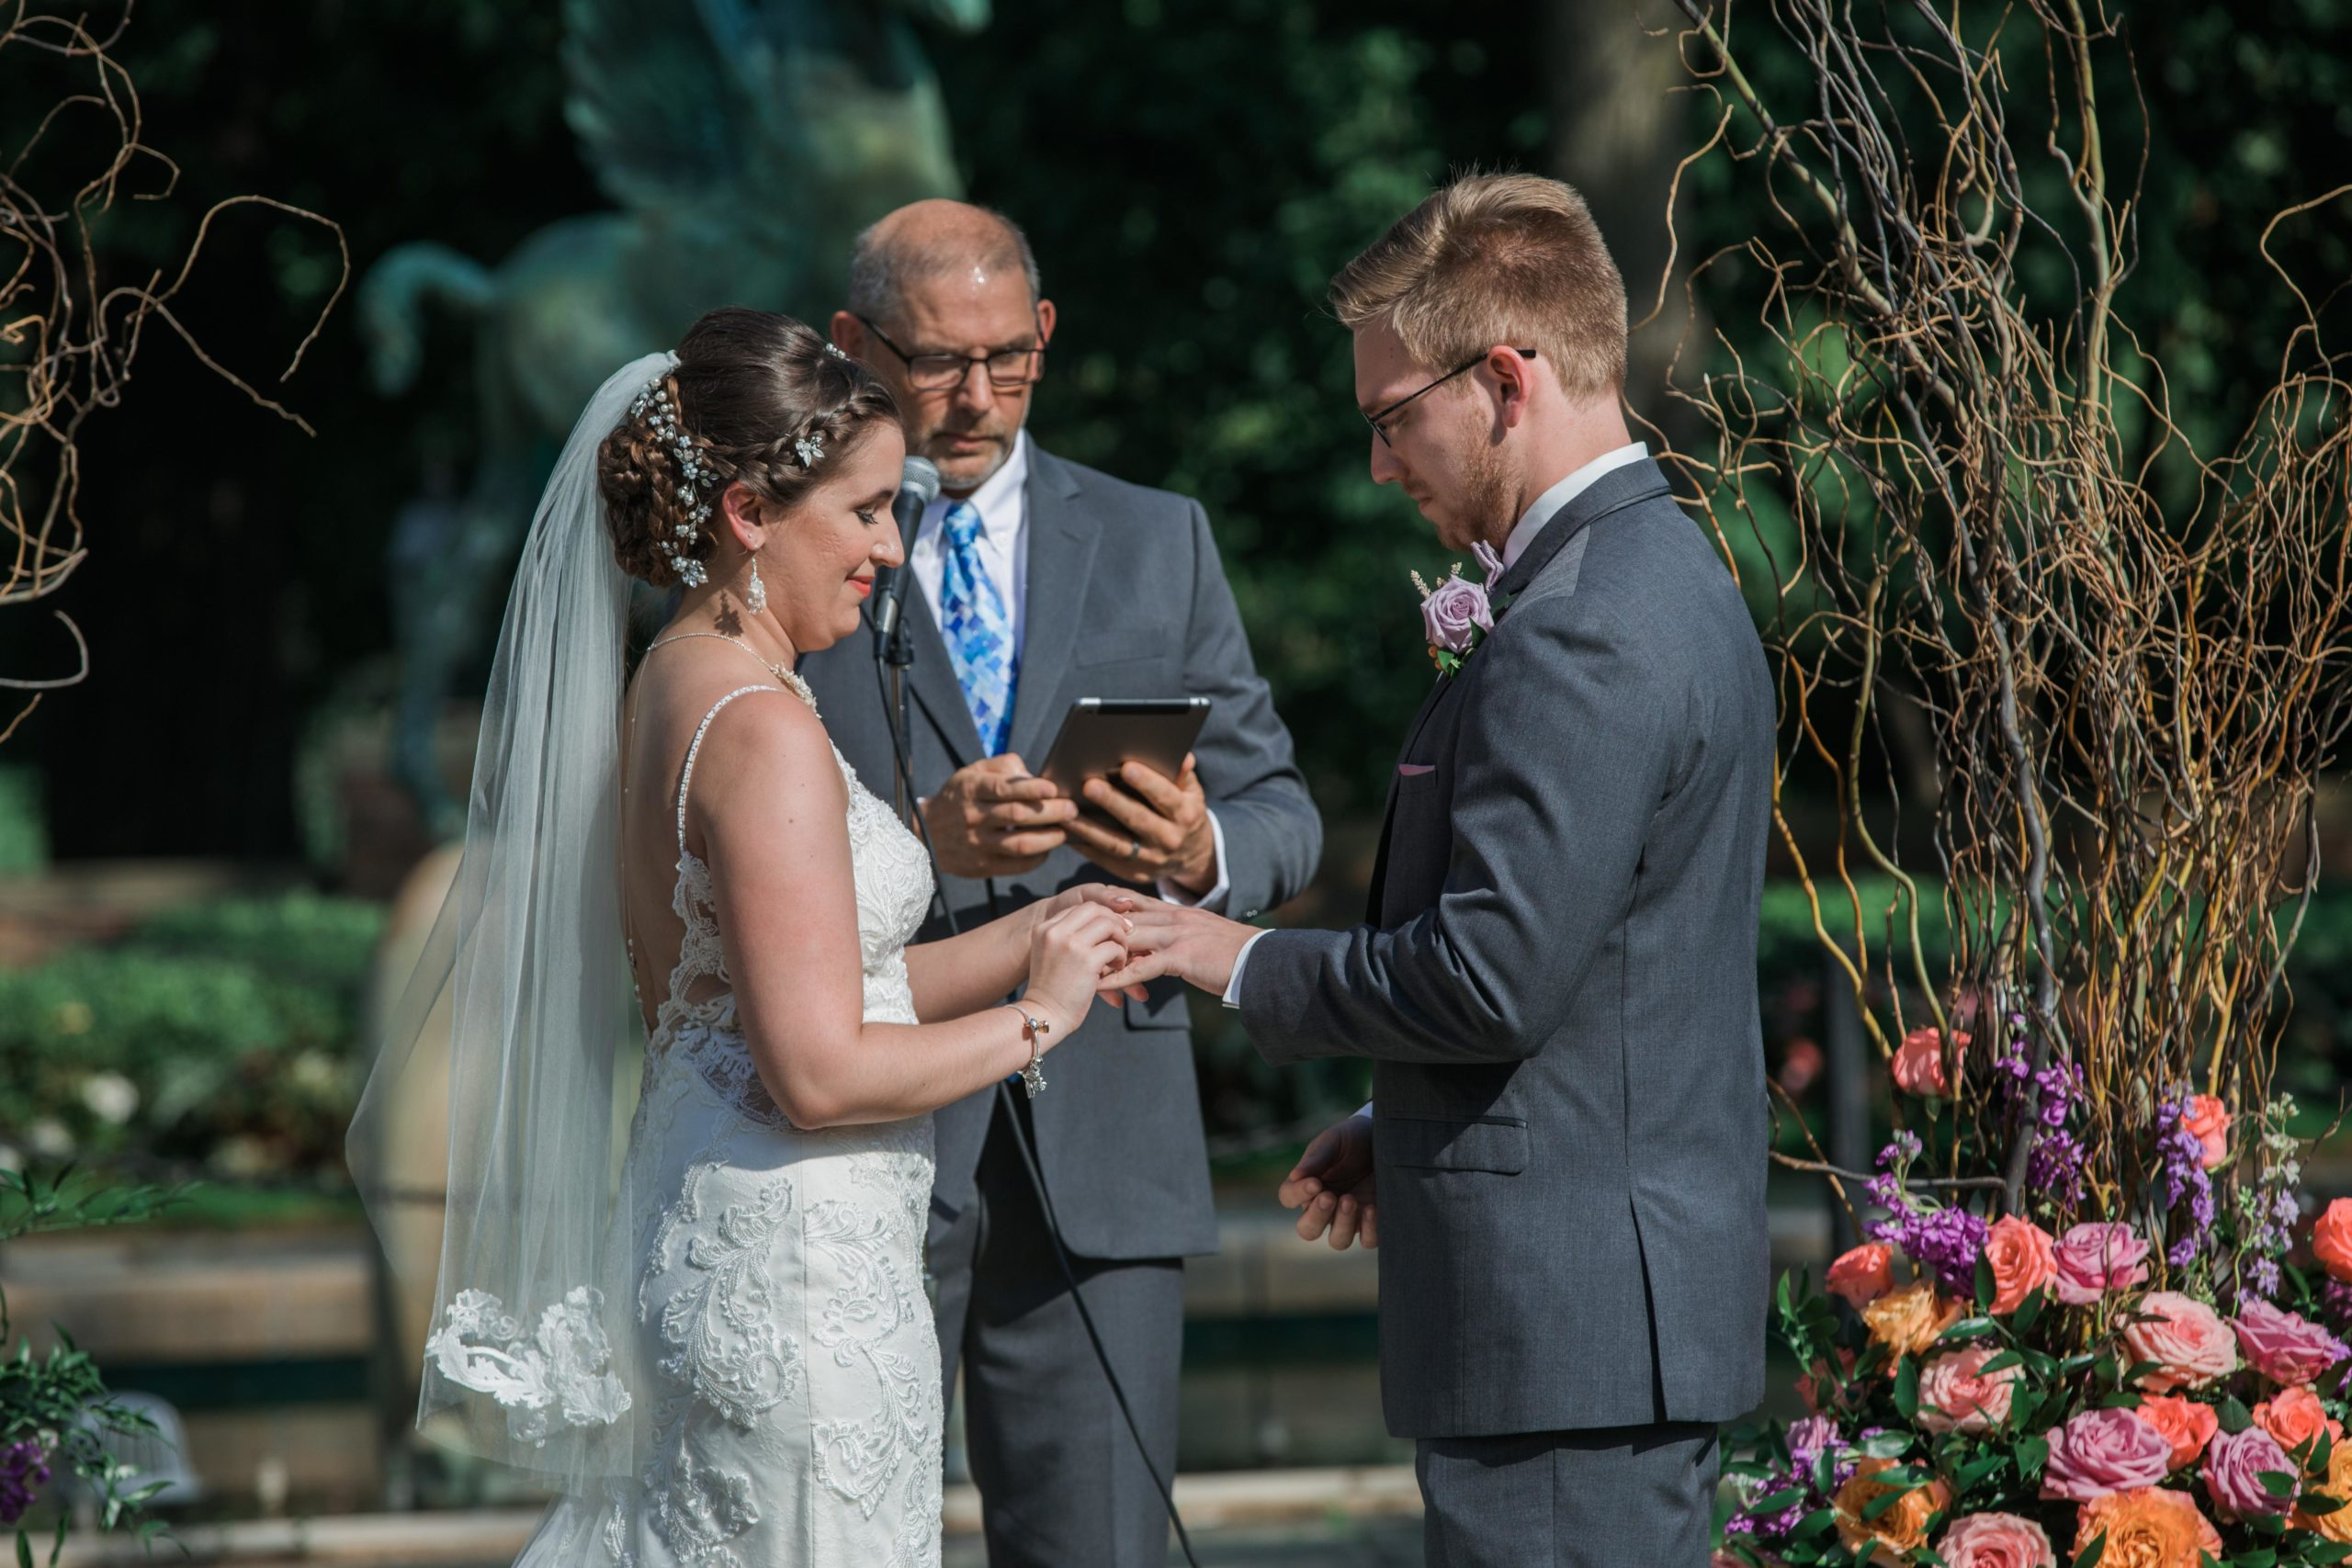 bride and groom outdoor wedding ceremony